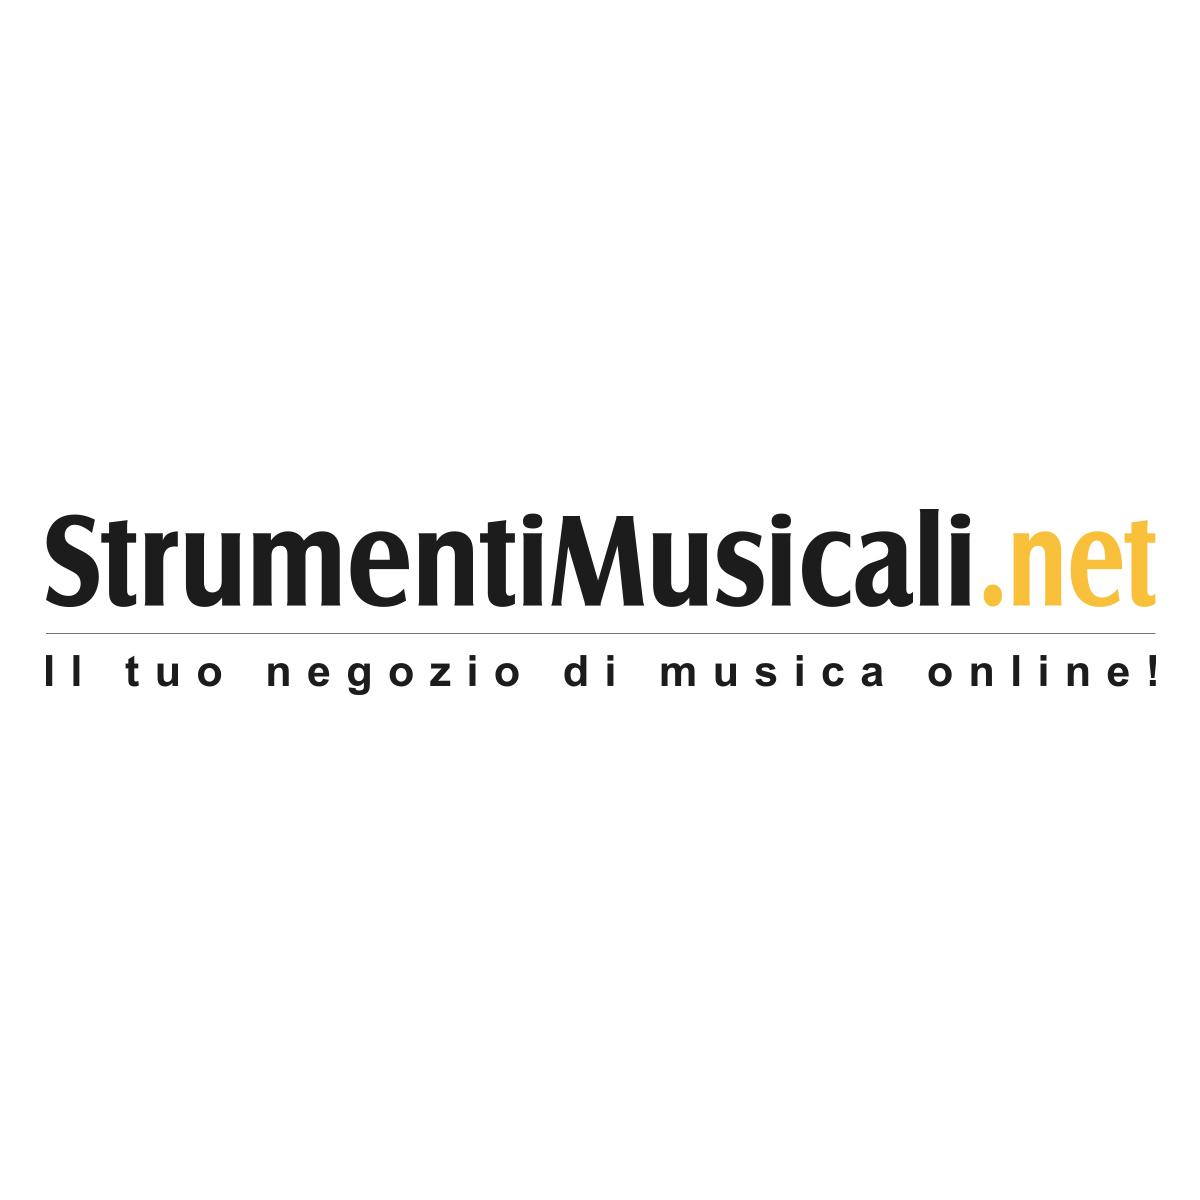 www.strumentimusicali.net